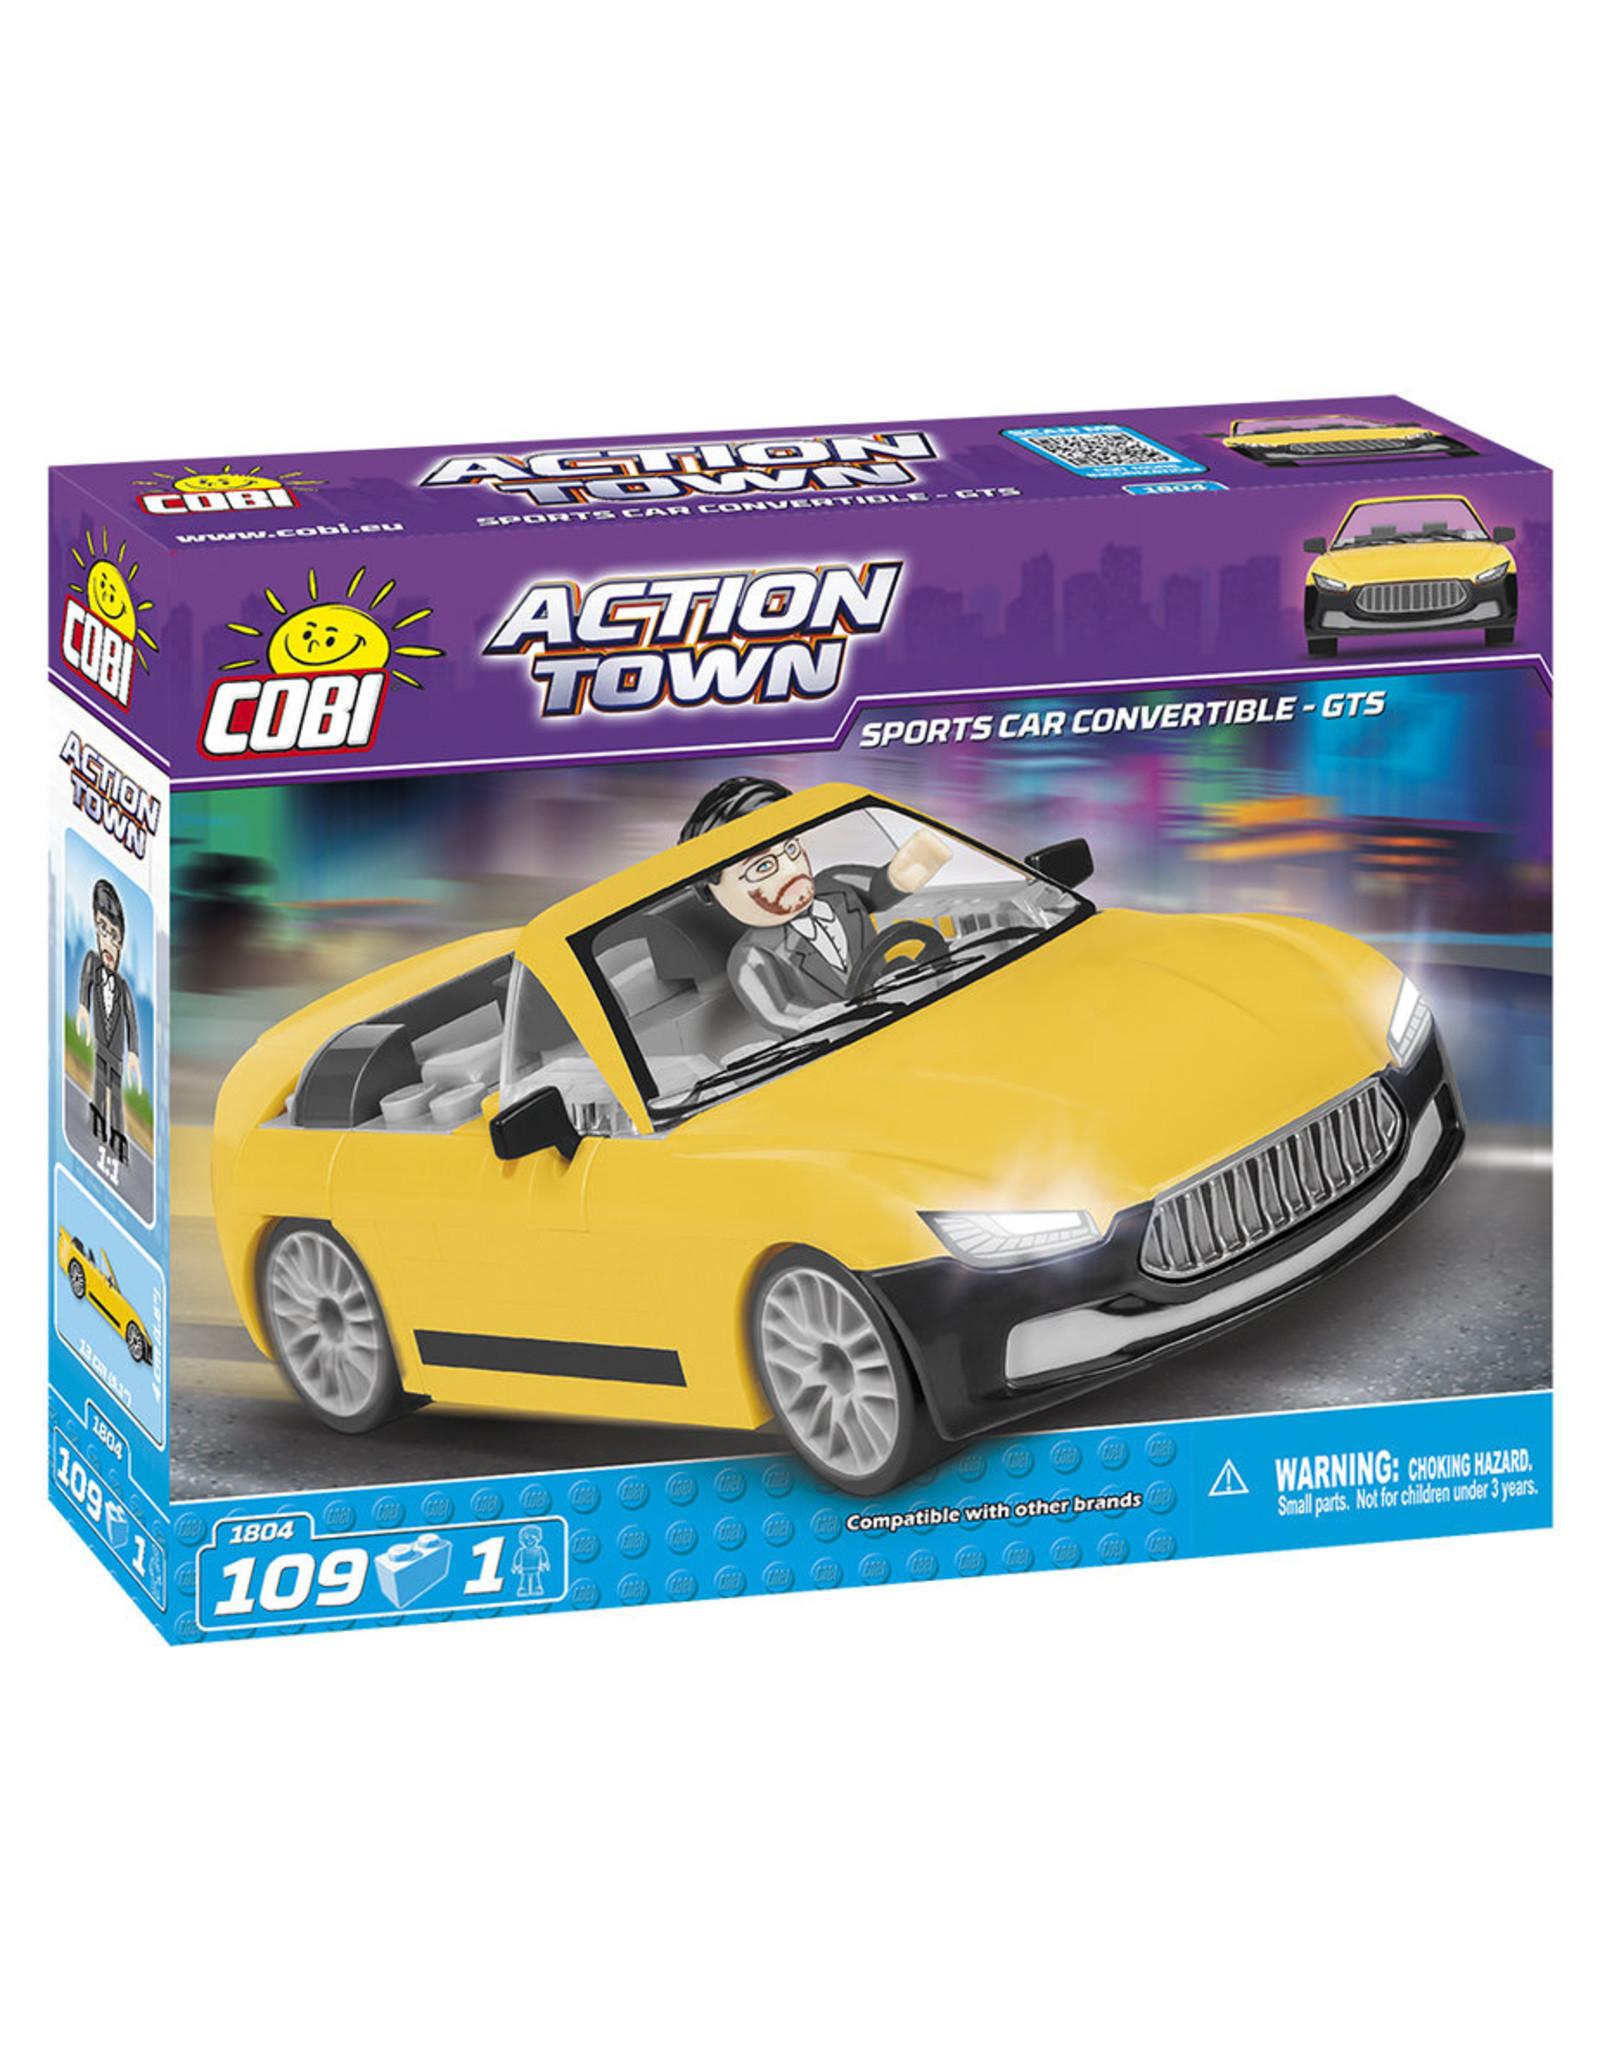 COBI COBI - Action Town 1804 - Sportcar Geel Cabrio